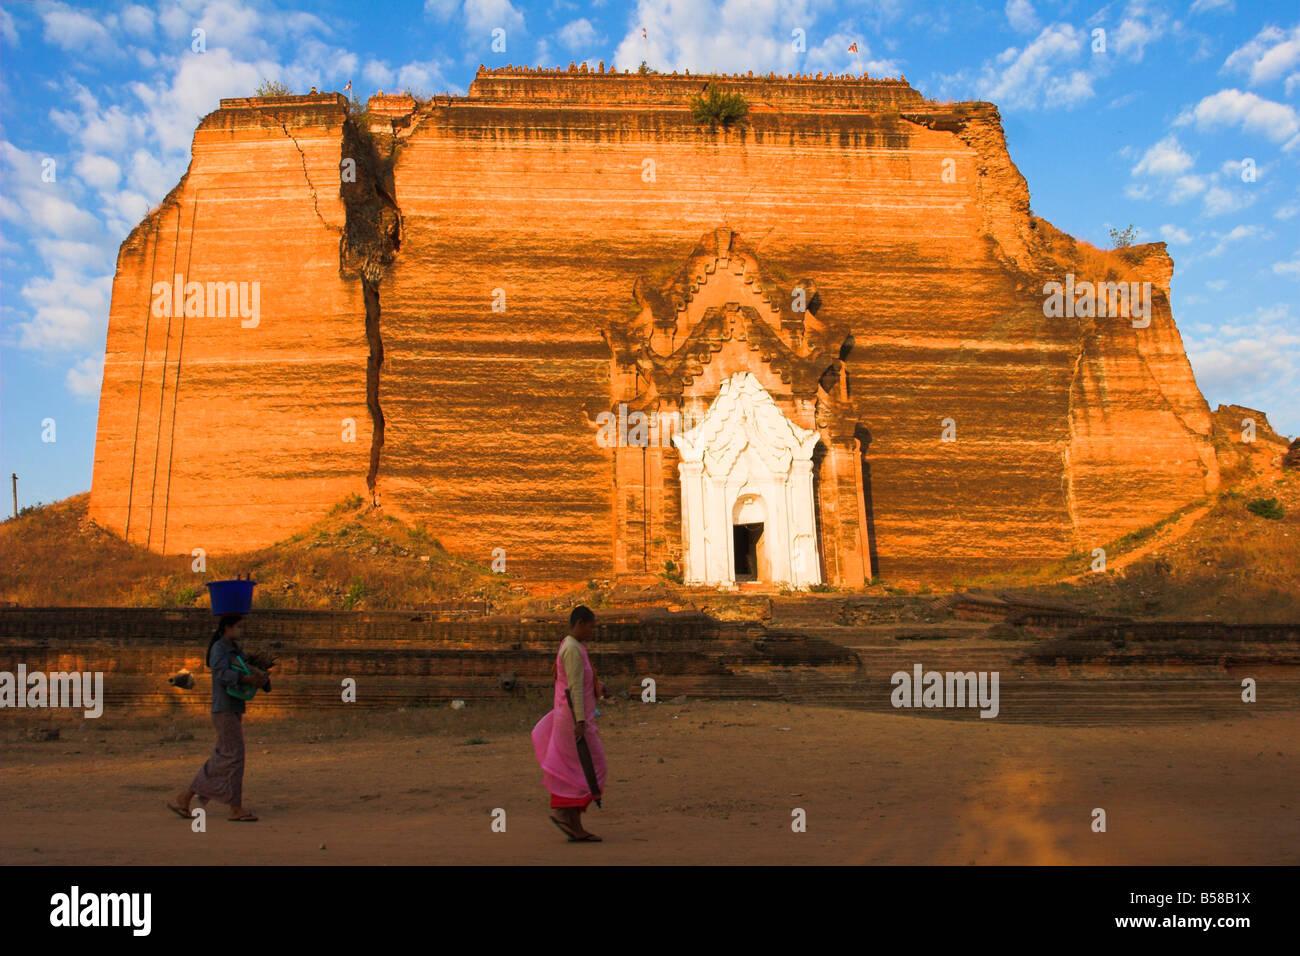 Woman and nun walk past paya damaged by earthquakes Mingun Paya Mingun Mandalay Myanmar Burma Asia - Stock Image